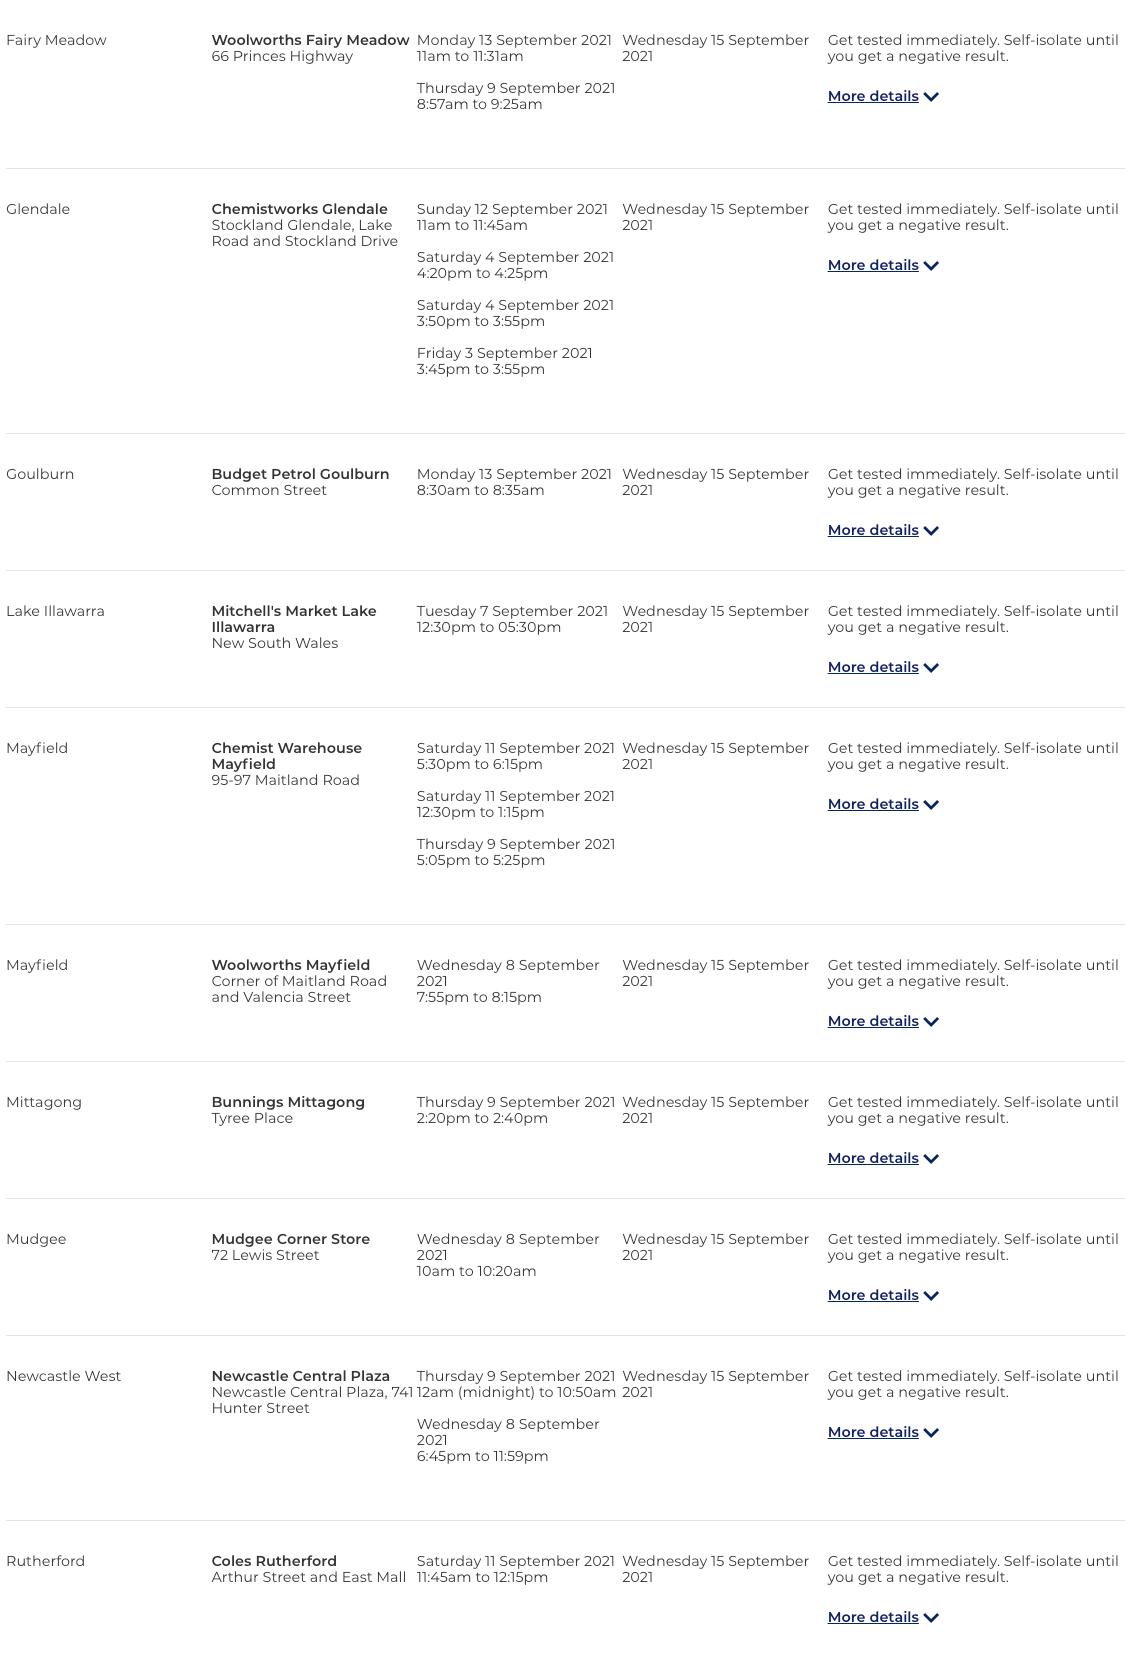 www.nsw.gov.au_covid-19_nsw-covid-19-case-locations_case-locations (37).png